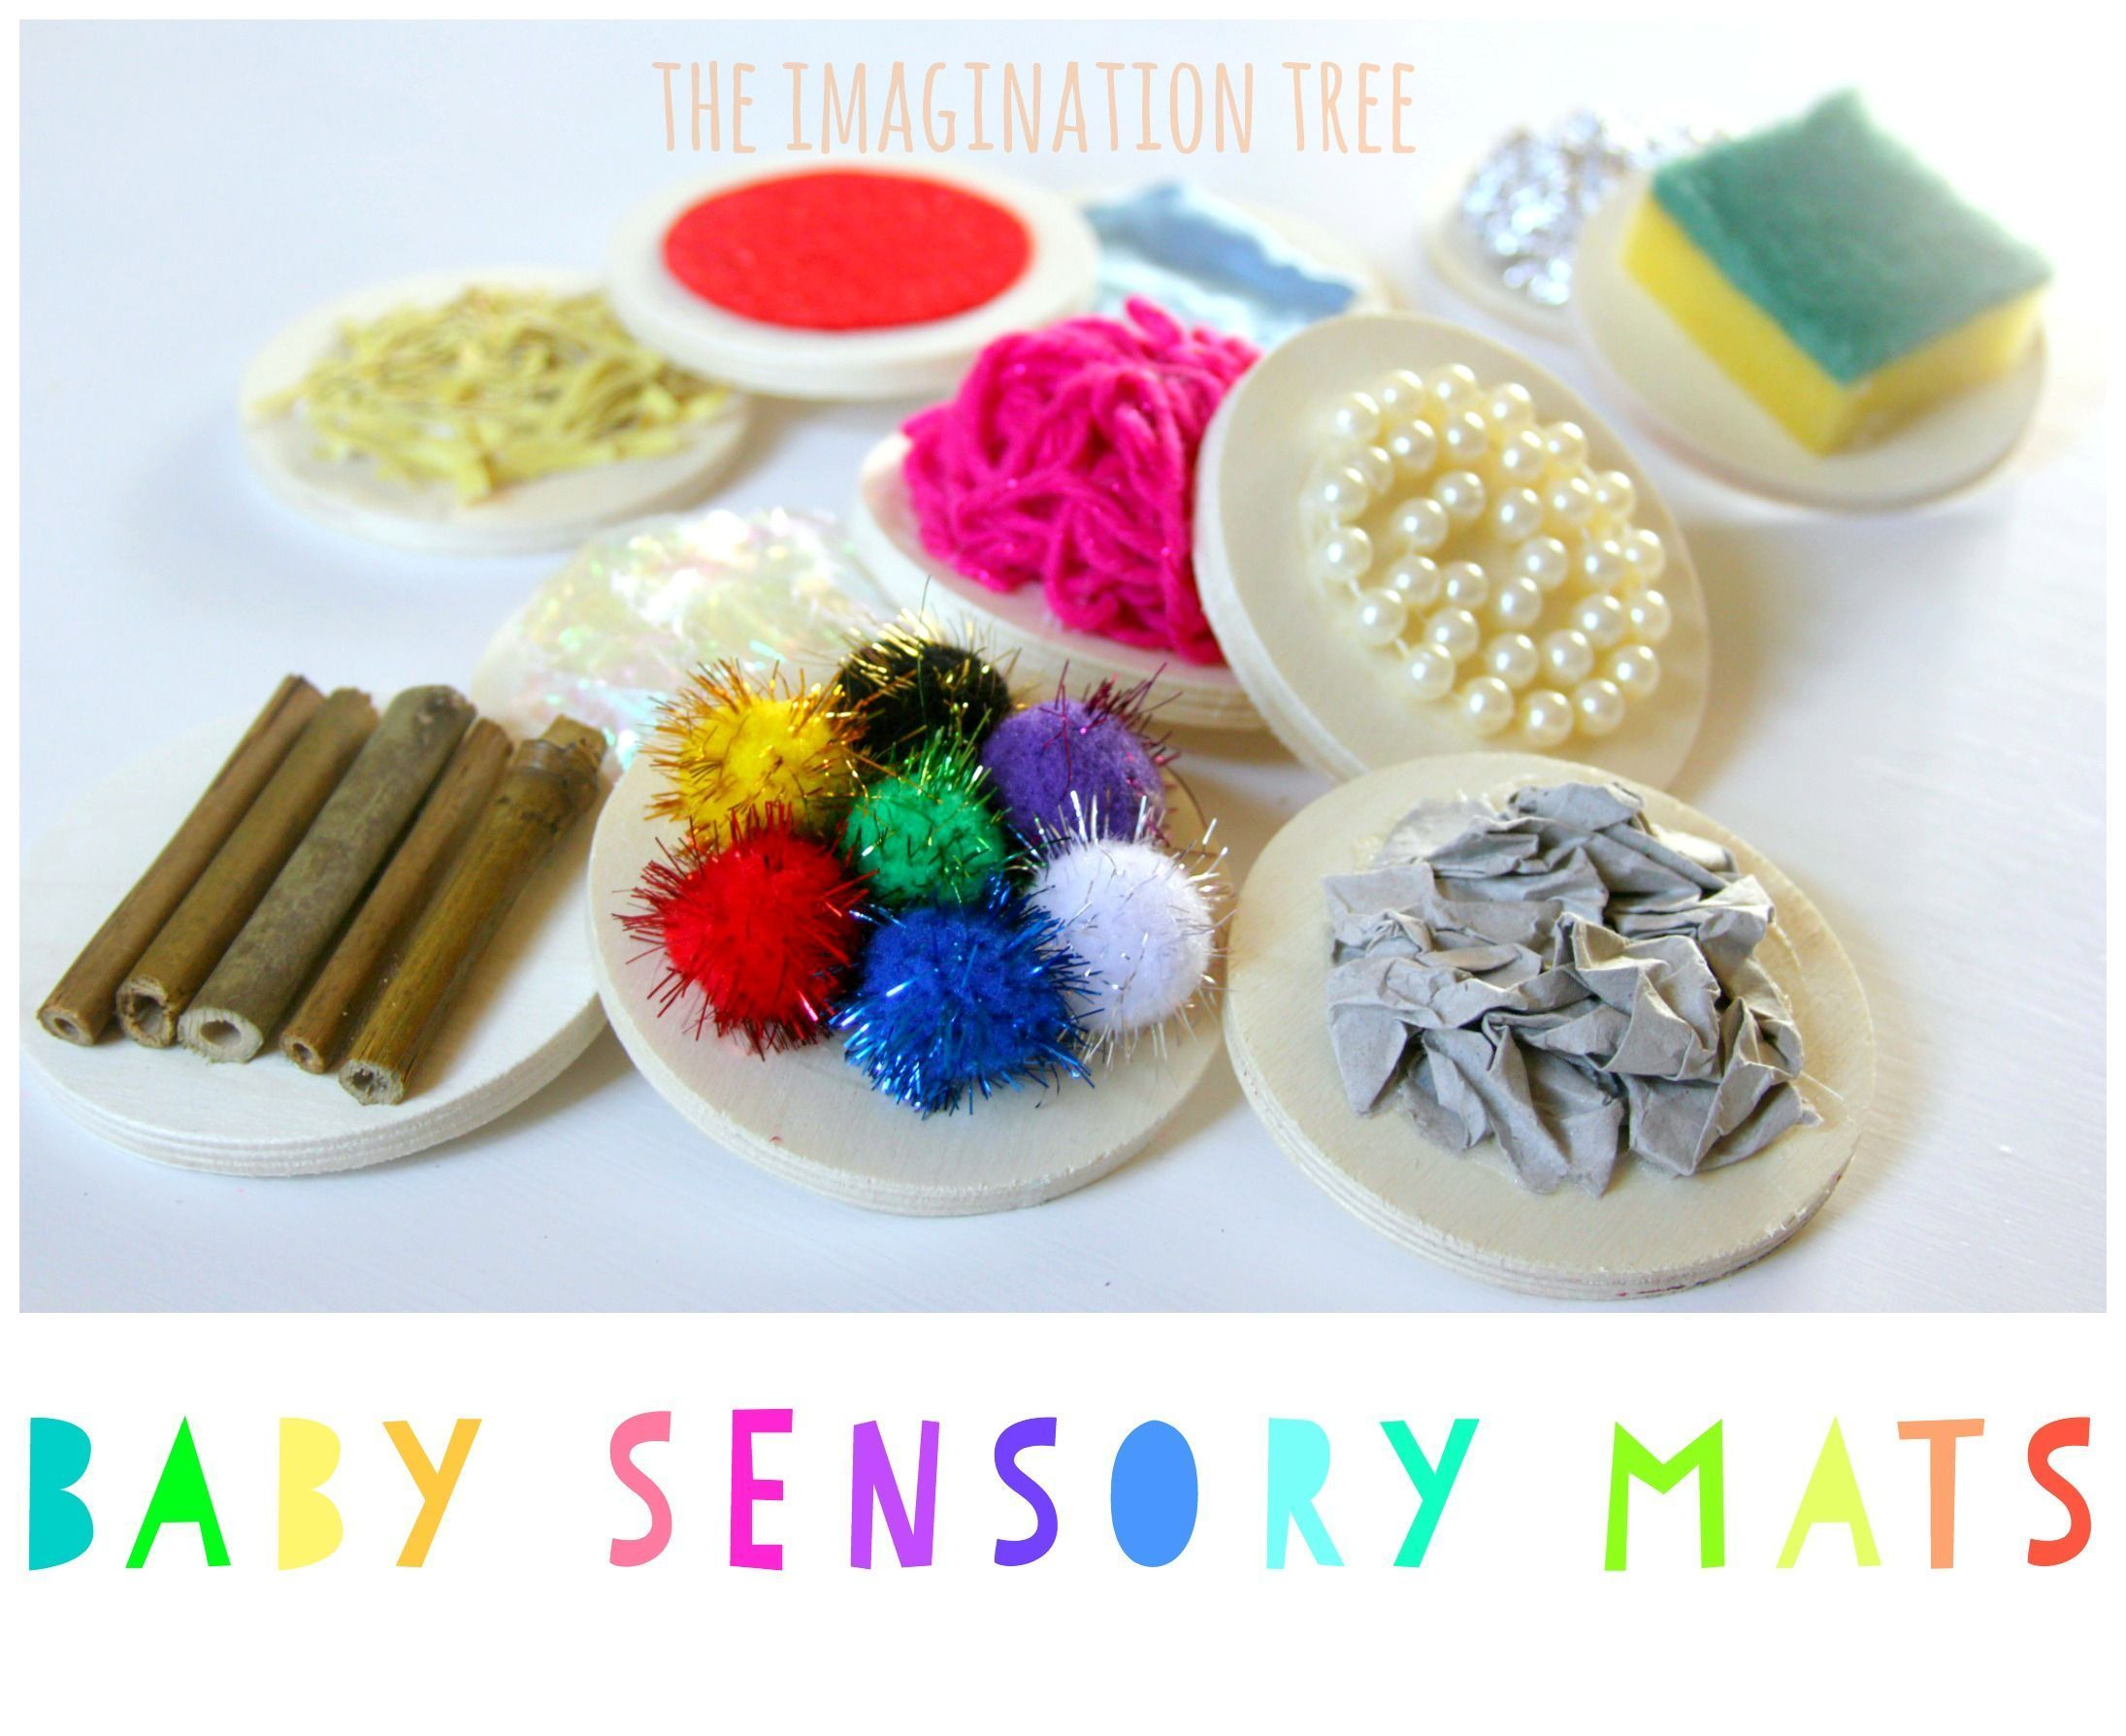 Diy sensory mats for babies and toddlers baby sensory